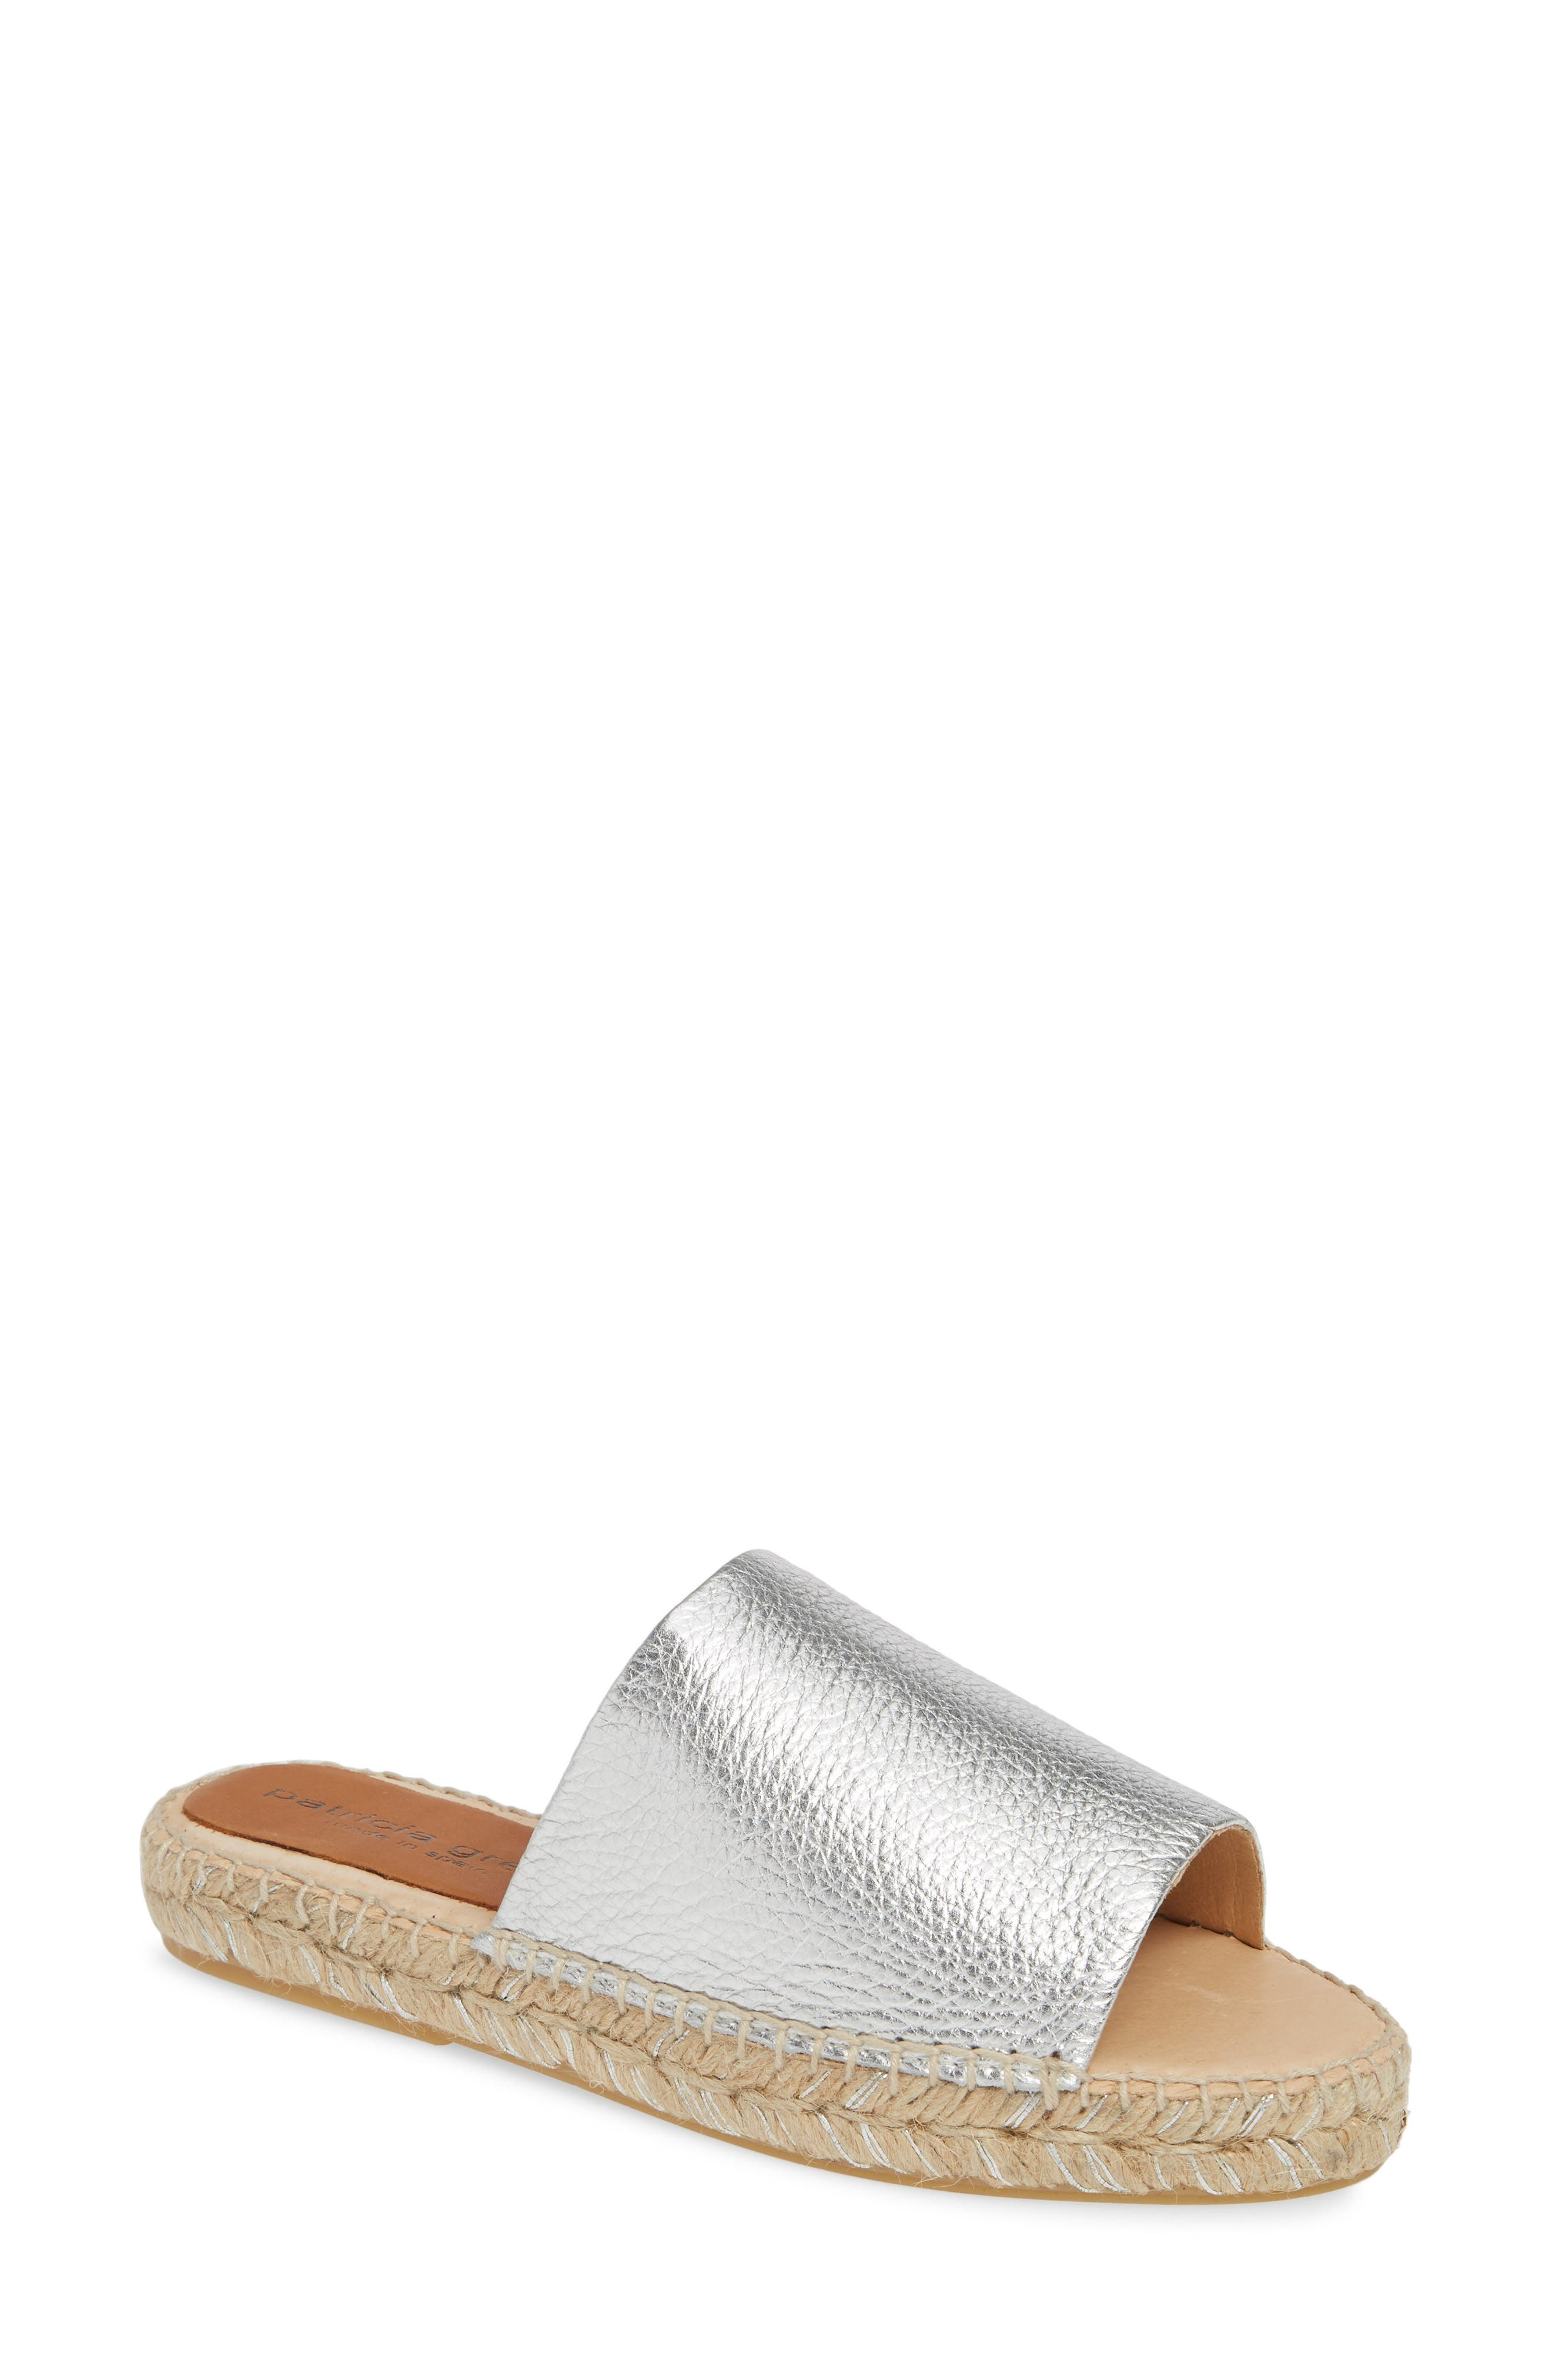 Patricia Green Portland Espadrille Slide Sandal, Metallic